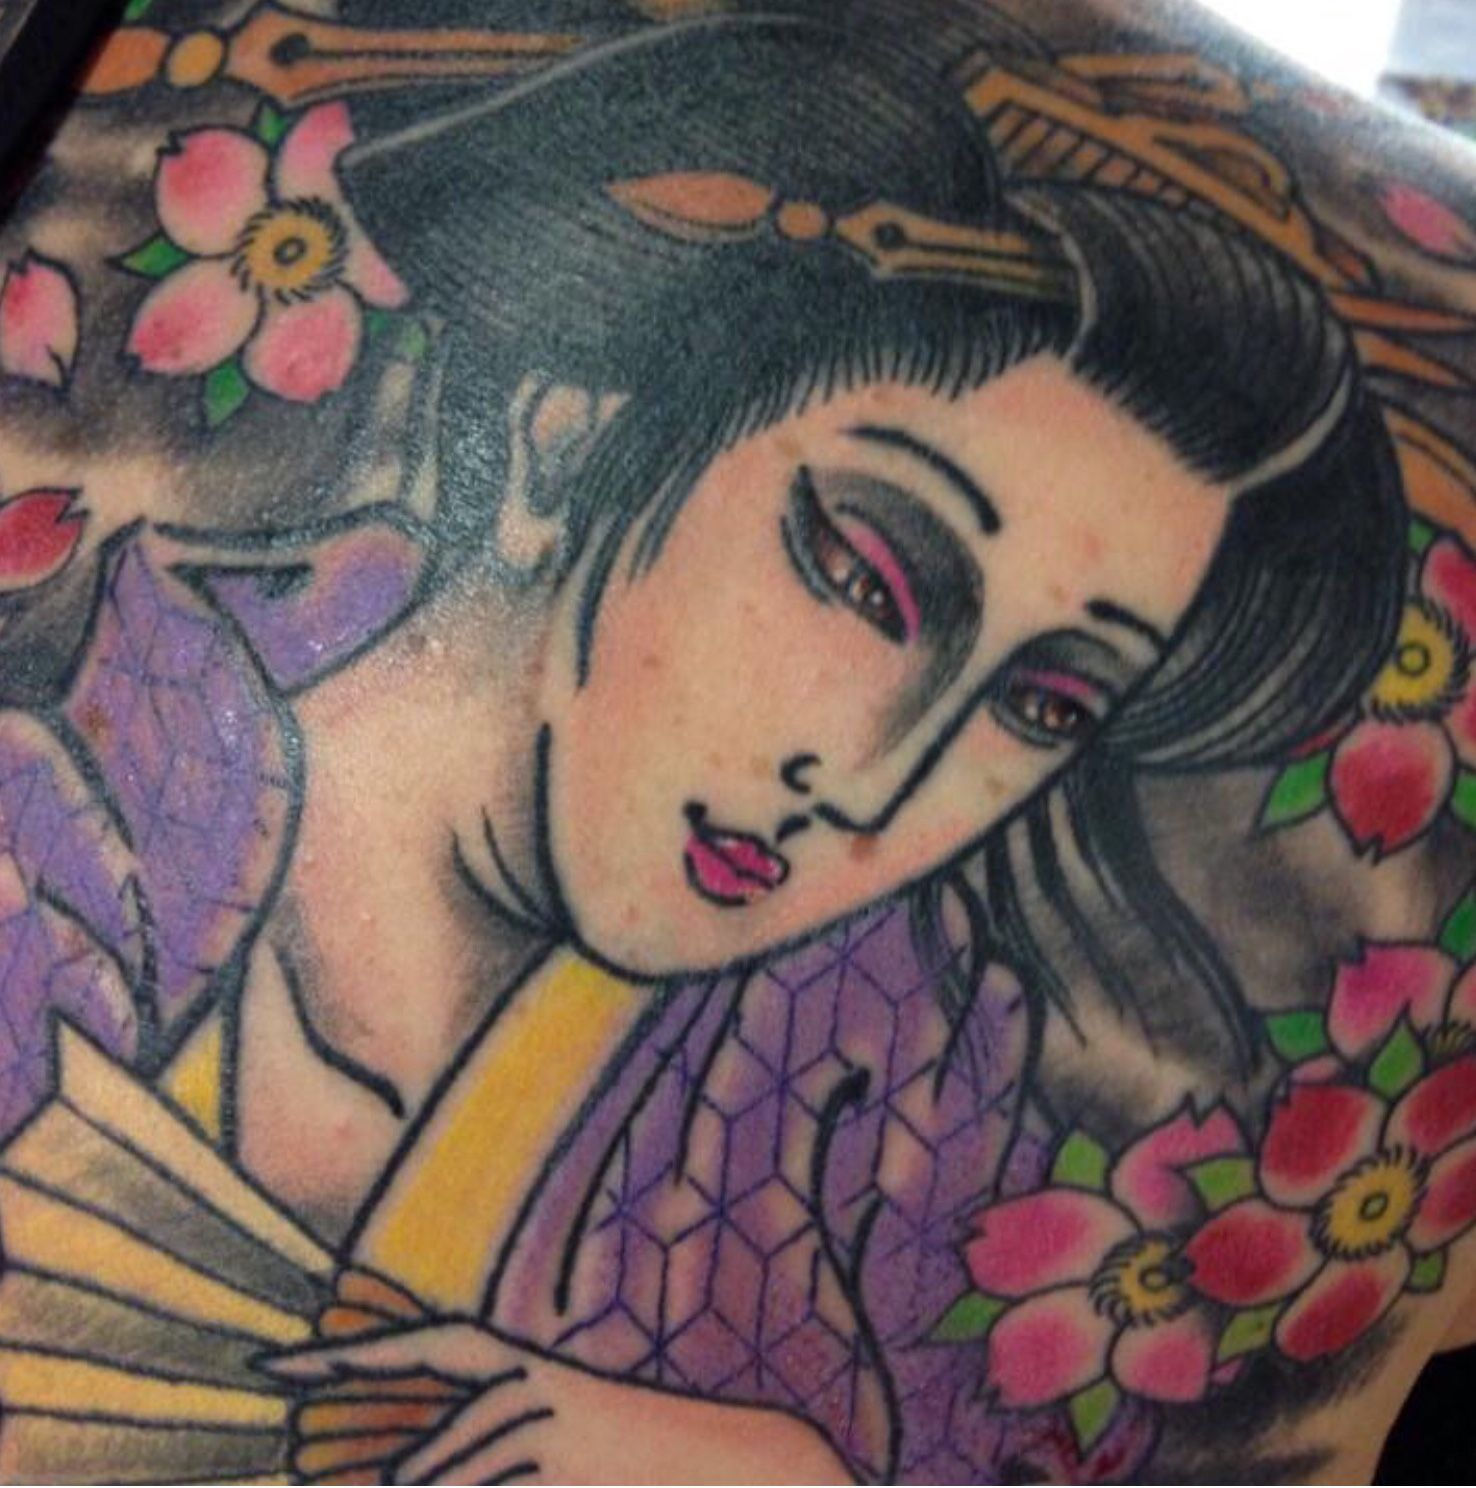 Pin by loopimble on tattoos loo pimble loopimble